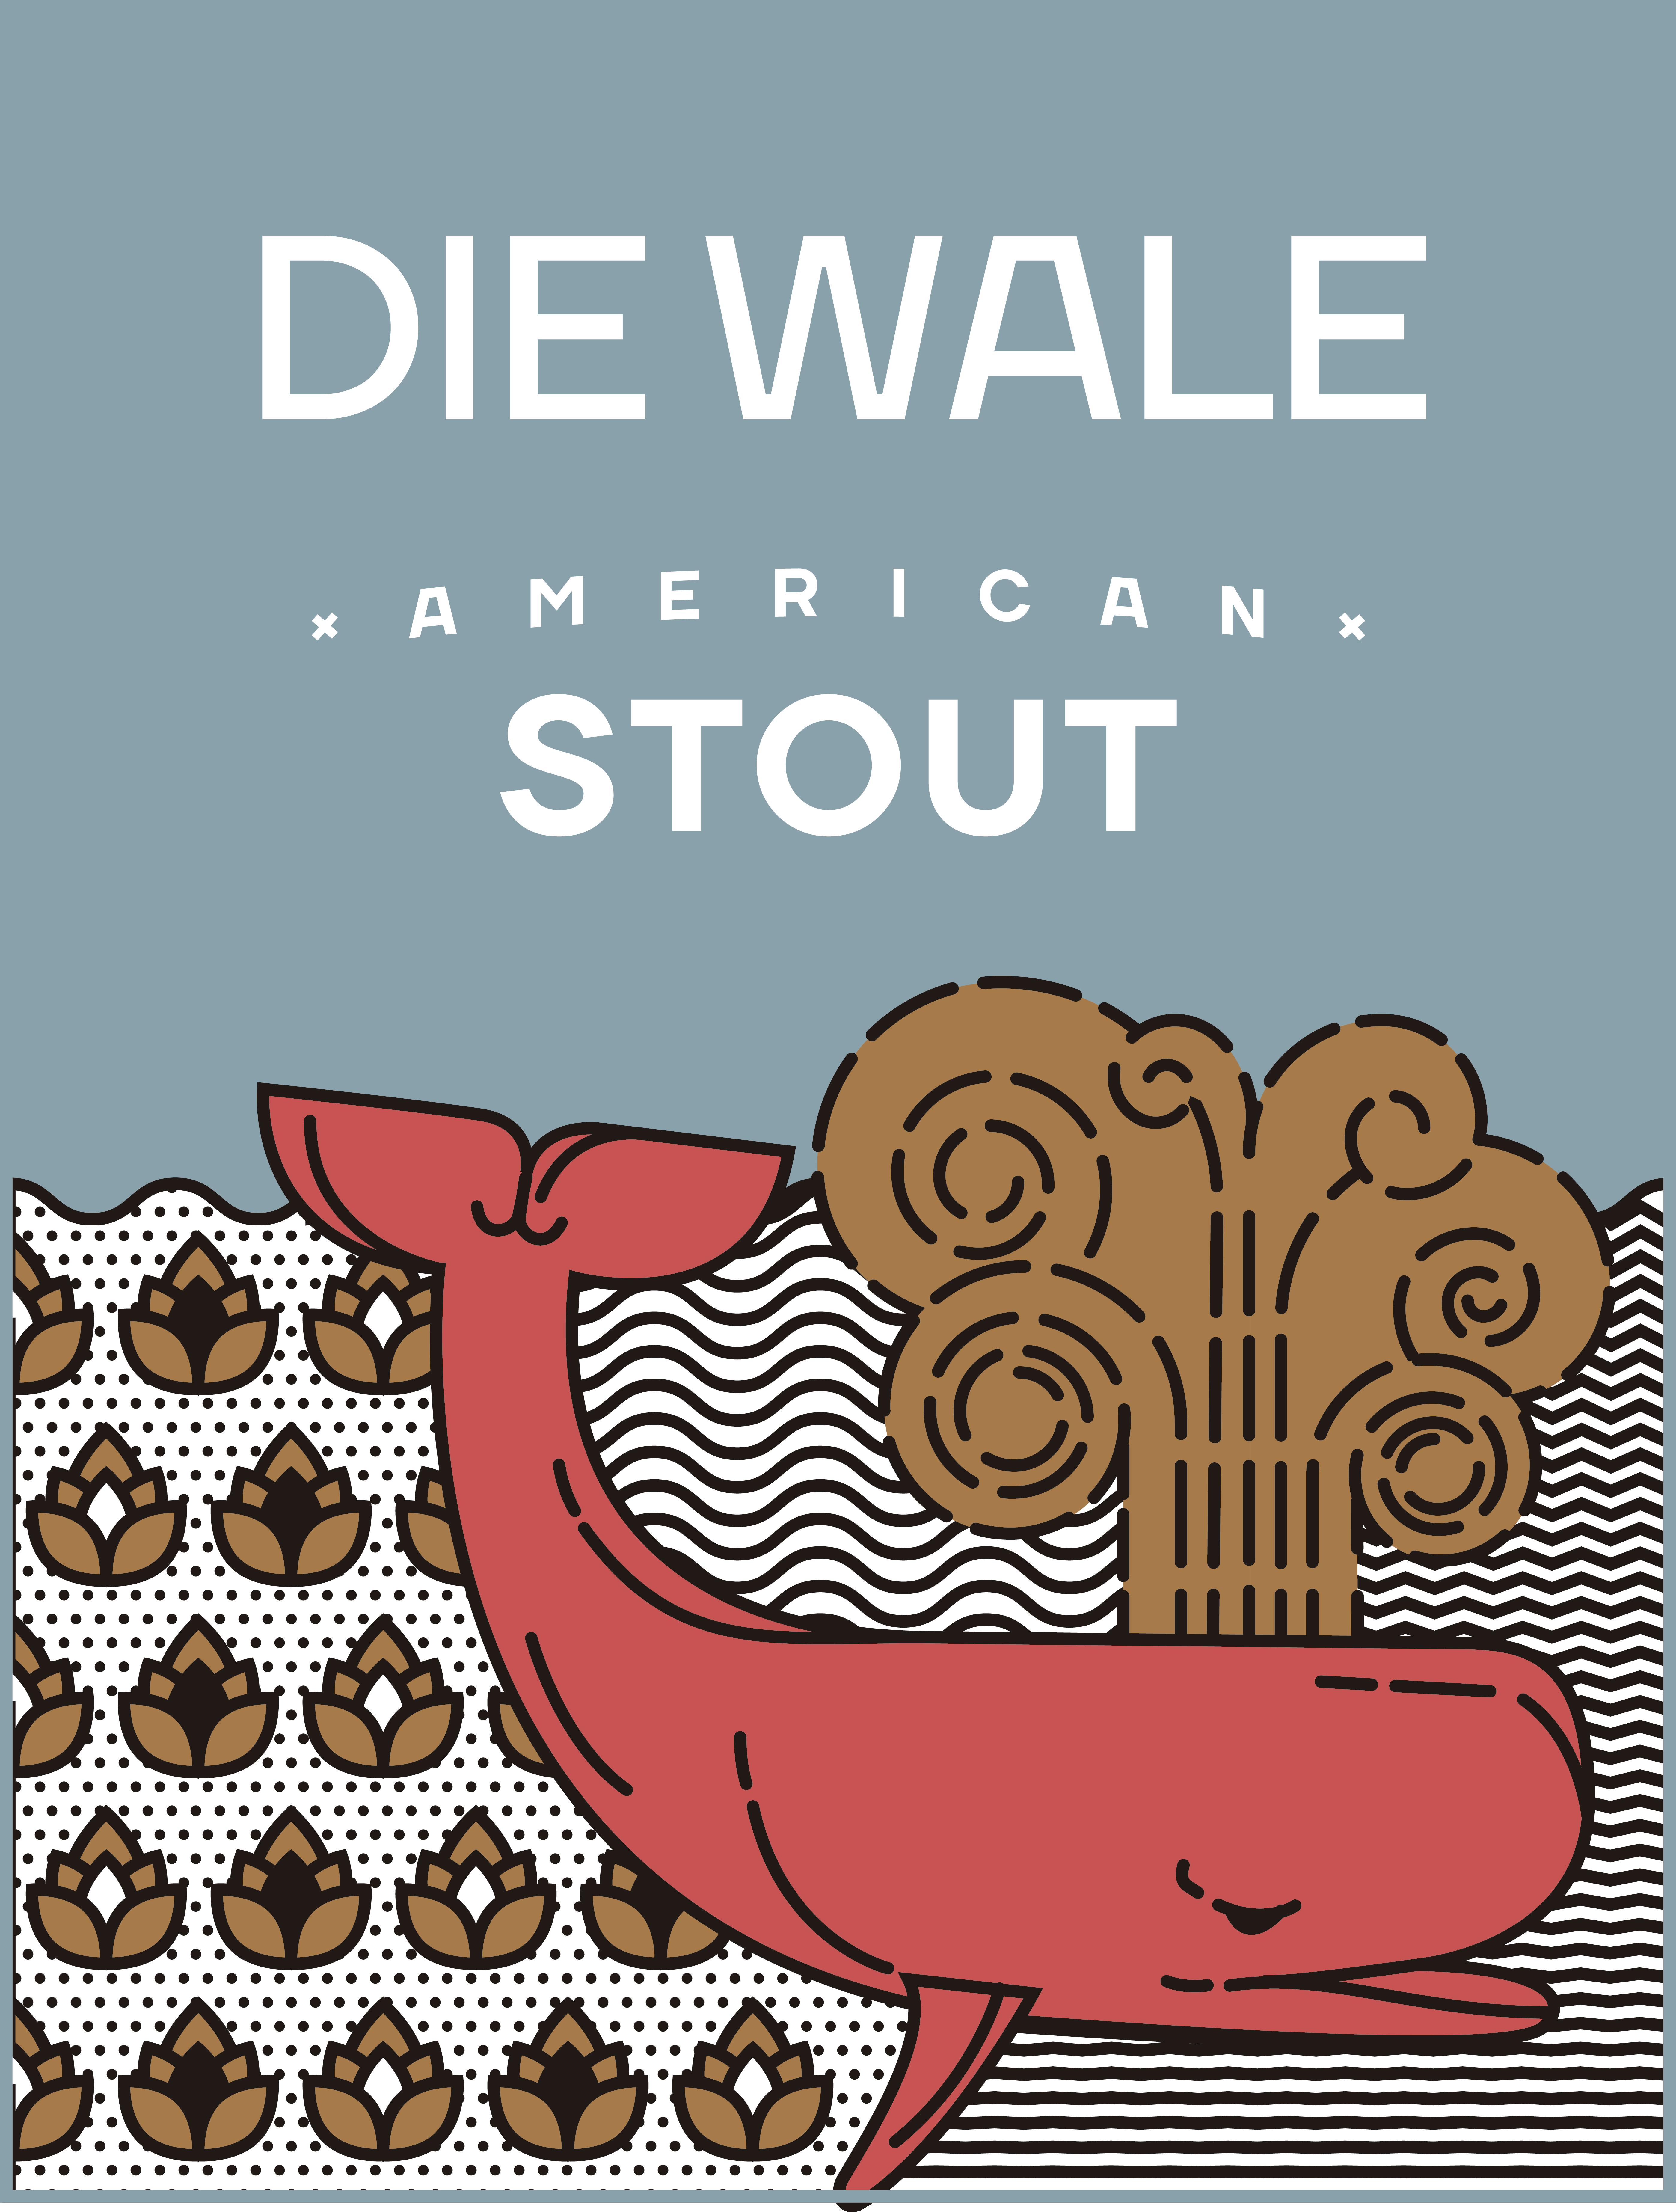 4 Pack [473cc] - Die Wale American Stout